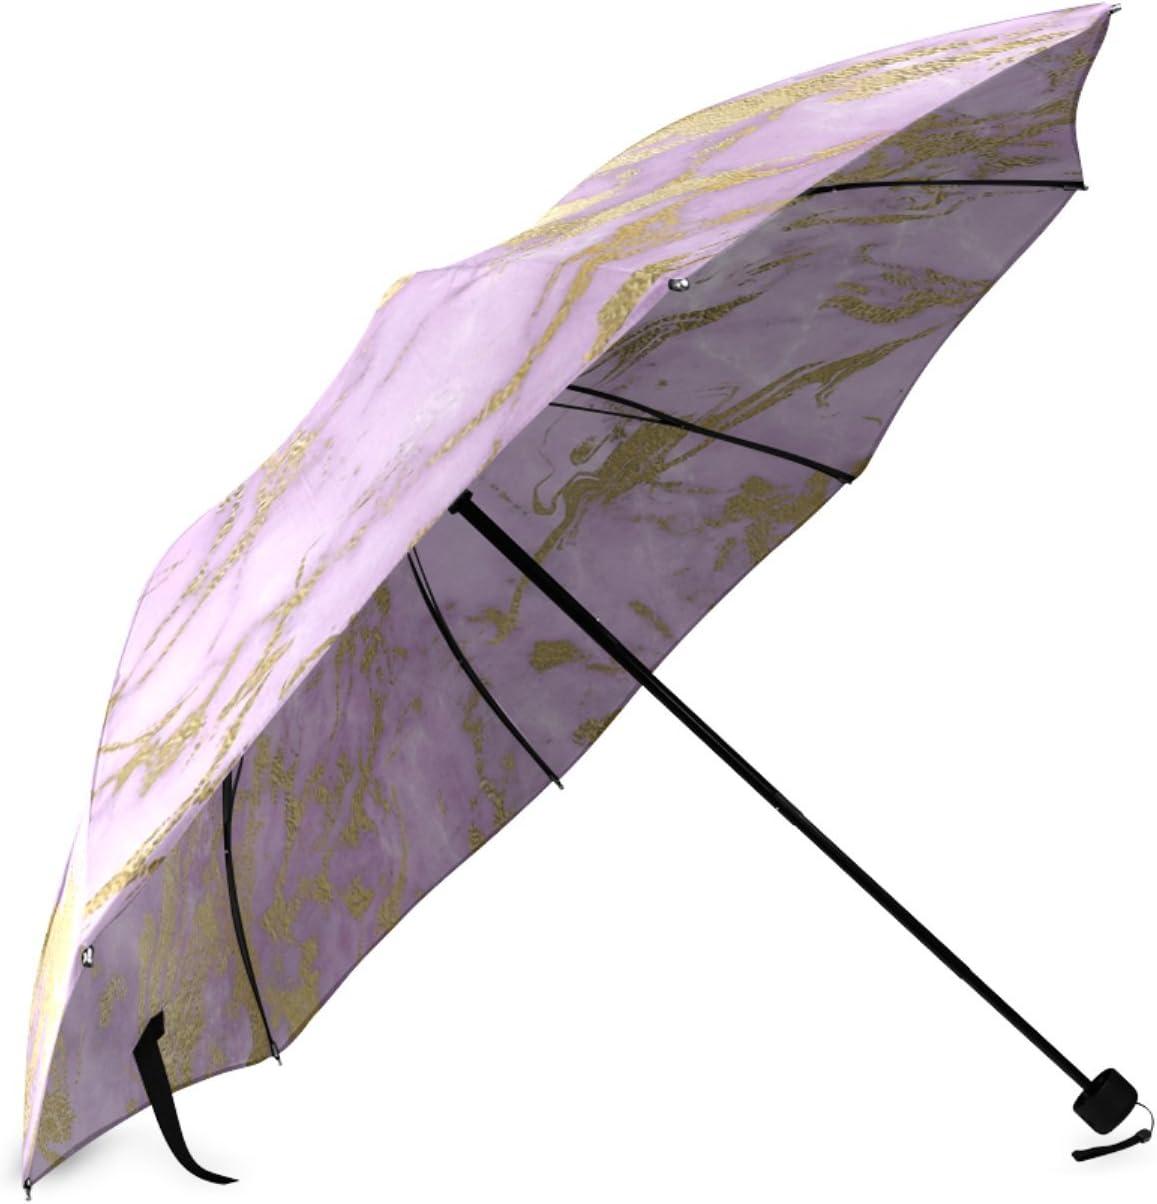 Personalized Lavender Gold Marble Foldable Umbrella Rain Compact Travel Umbrella